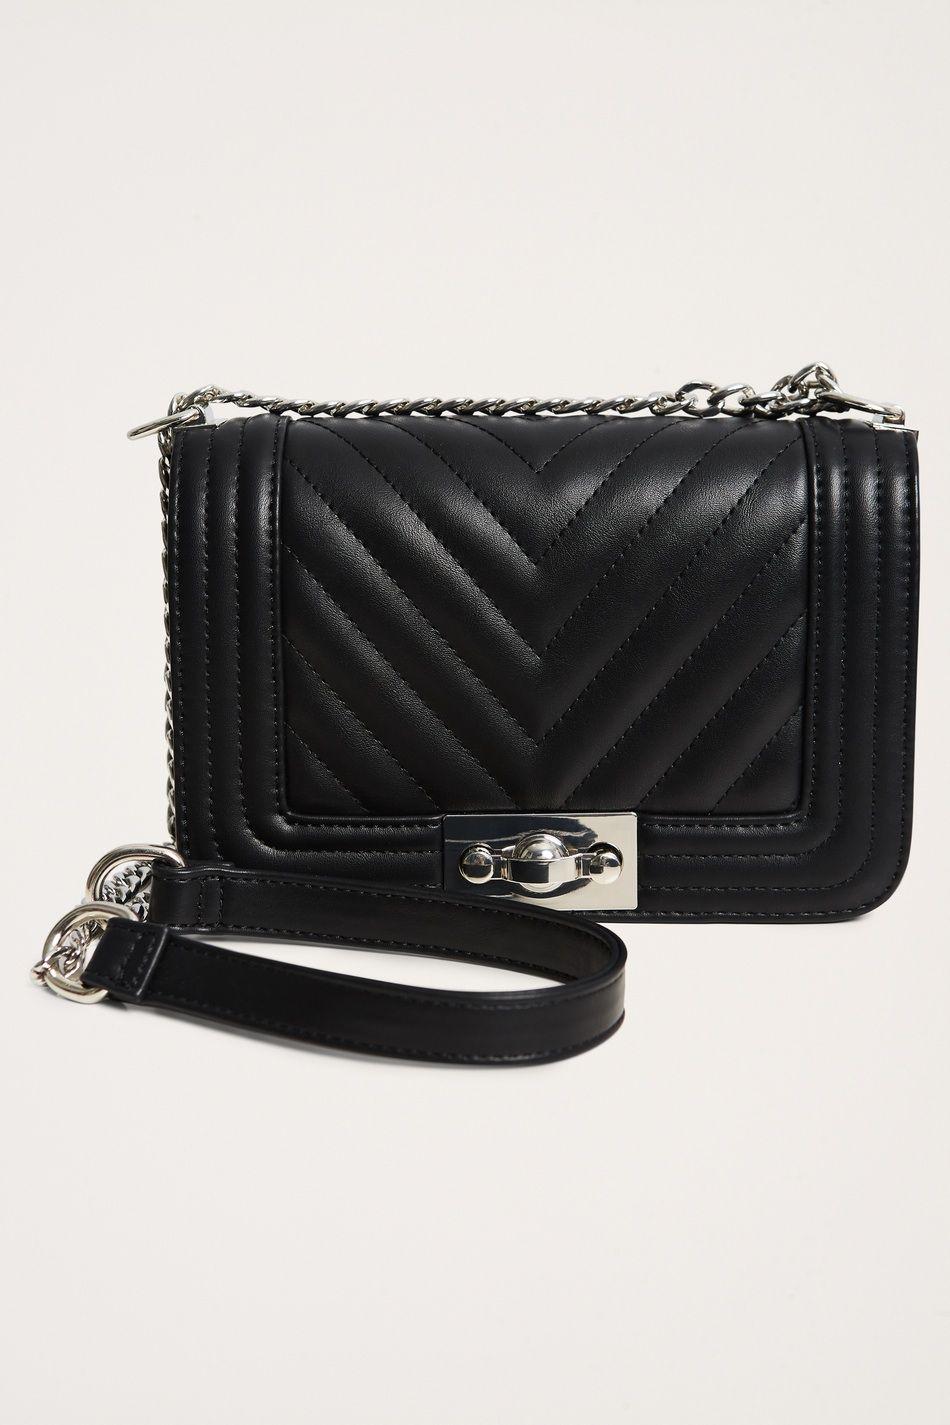 c8190bf80d5b Matilda väska 299.00 SEK, Väskor & Plånböcker - Gina Tricot | My ...